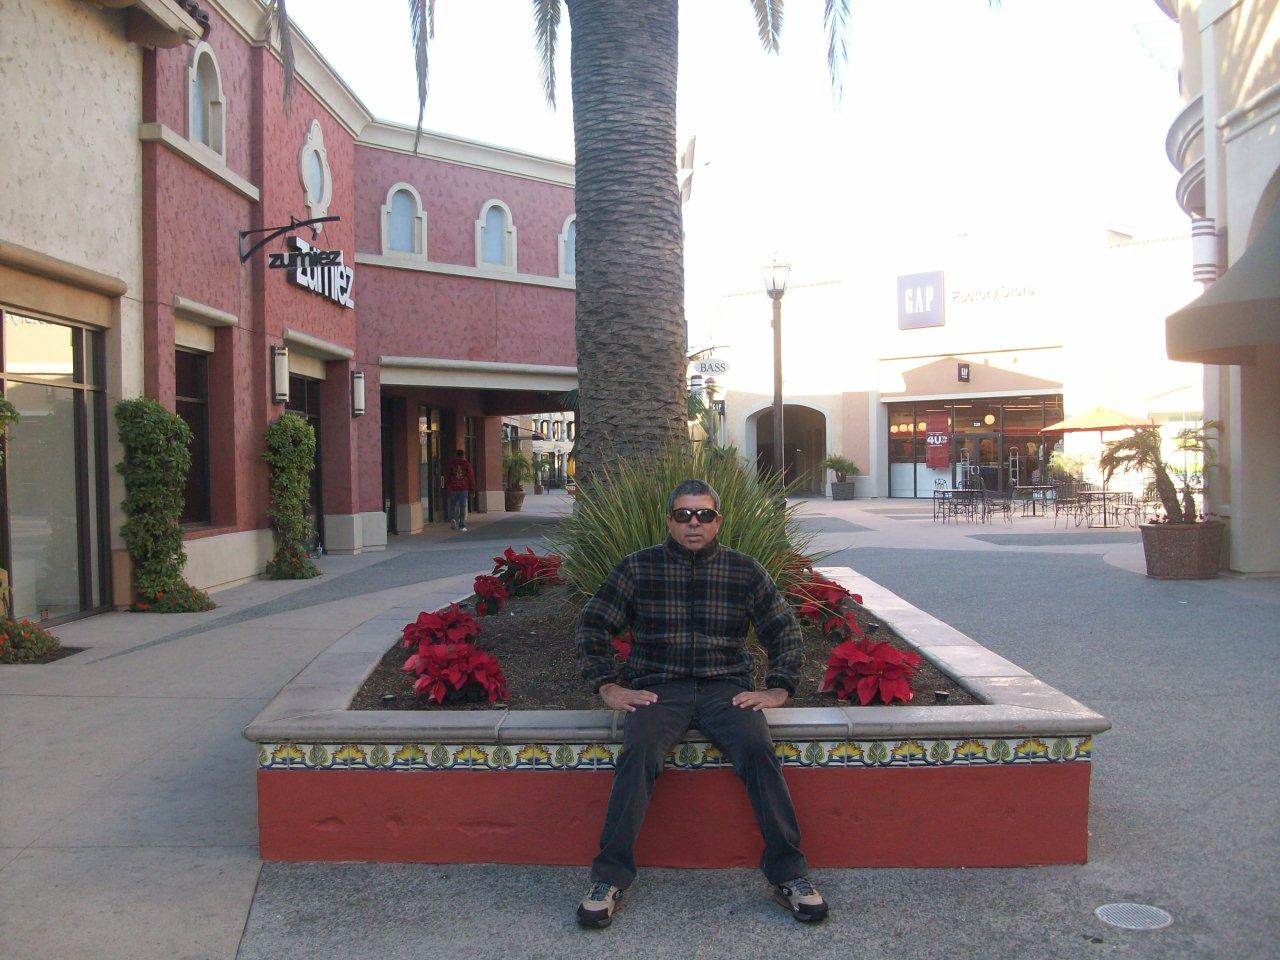 Home>Browse Jobs>Jobs in the United States>Jobs in California> San Ysidro, CA San Ysidro Jobs. Camino de la Plaza San Ysidro, CA Retail Security Guard - Las Americas Premium Outlets. Allied Universal. San Ysidro, CA San Ysidro, CA. Apply. Host or .